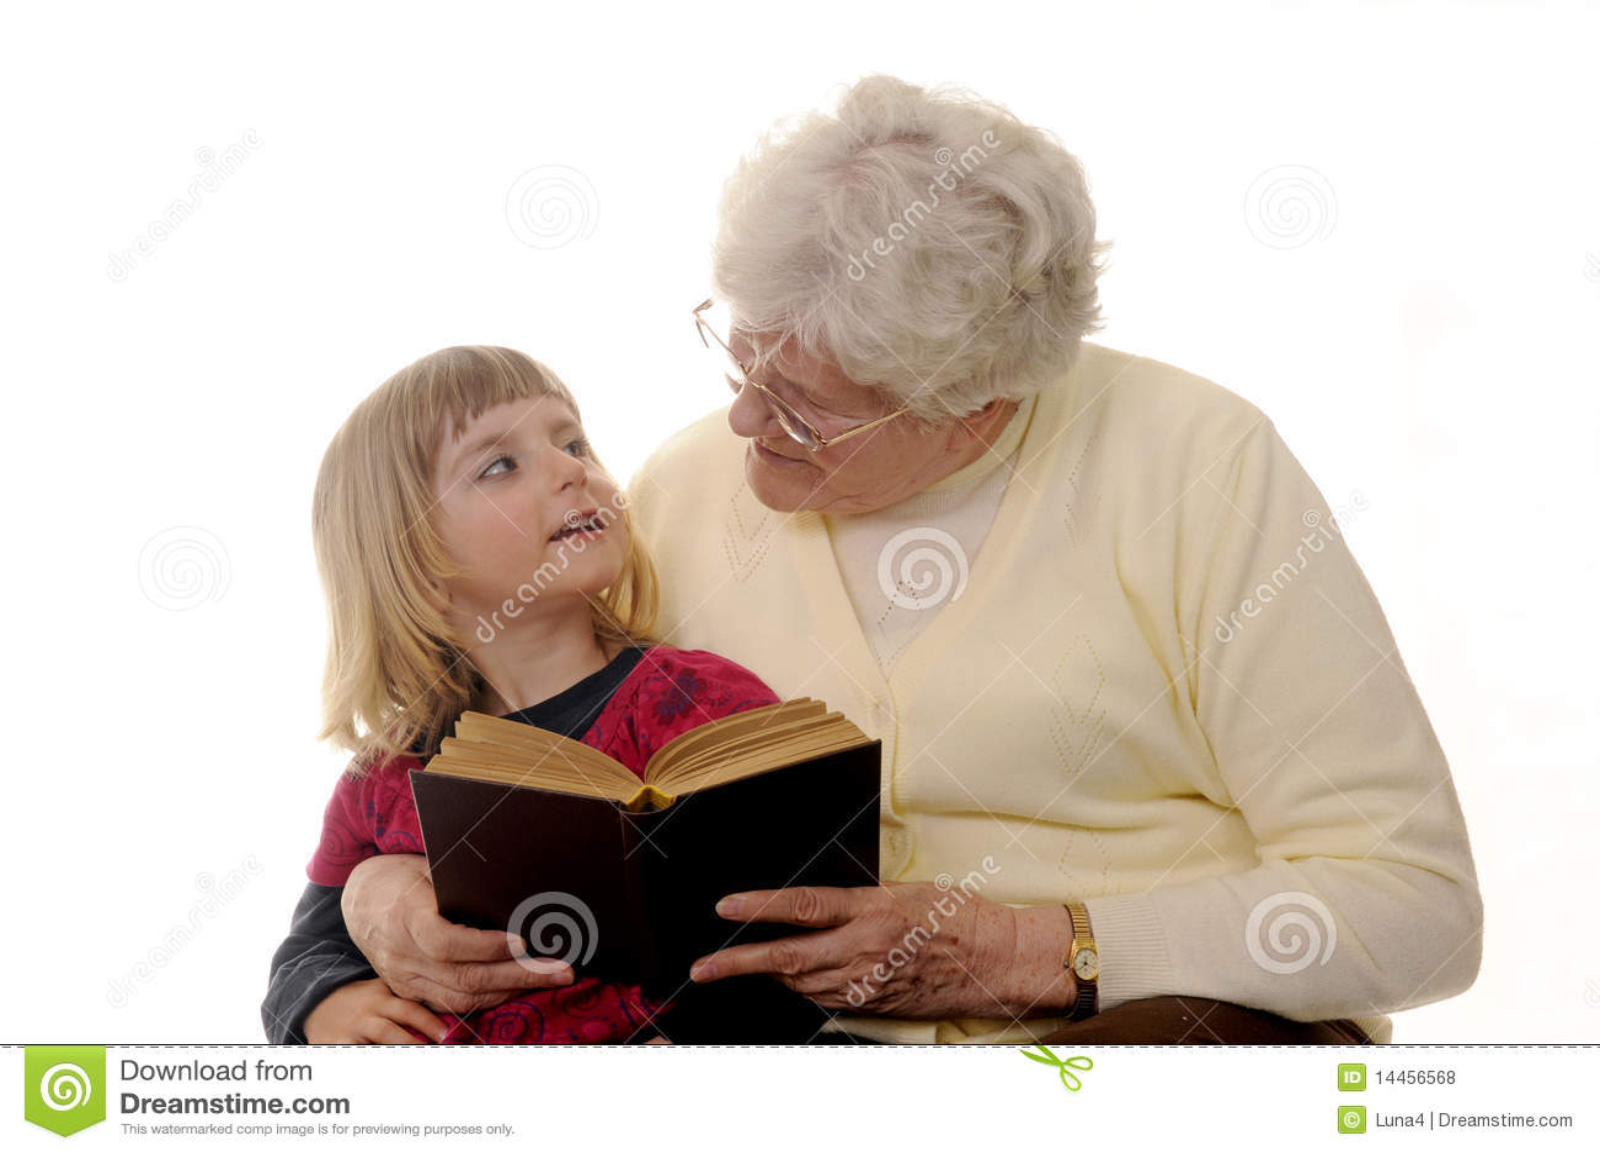 Grandma And Granddaughter Royalty Free Stock Photos - Image: 14456568